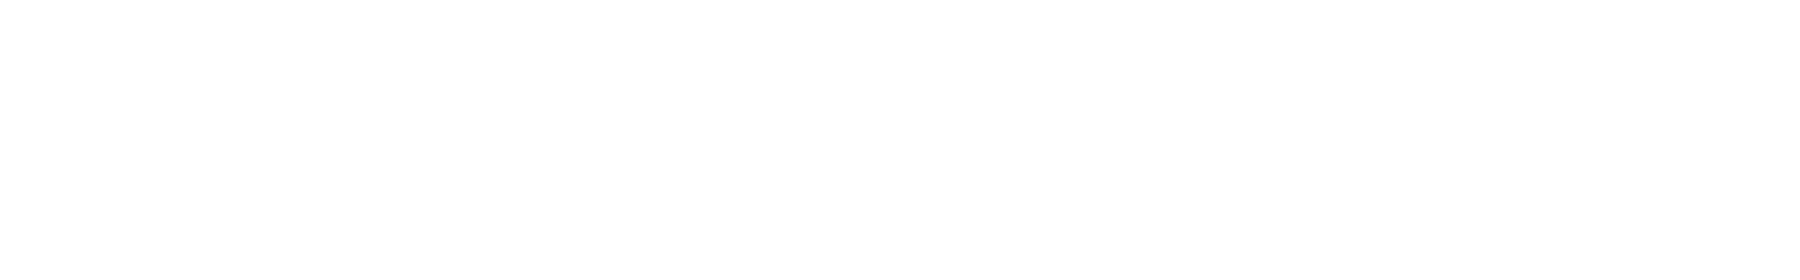 bluezone bc0210 percussion 014